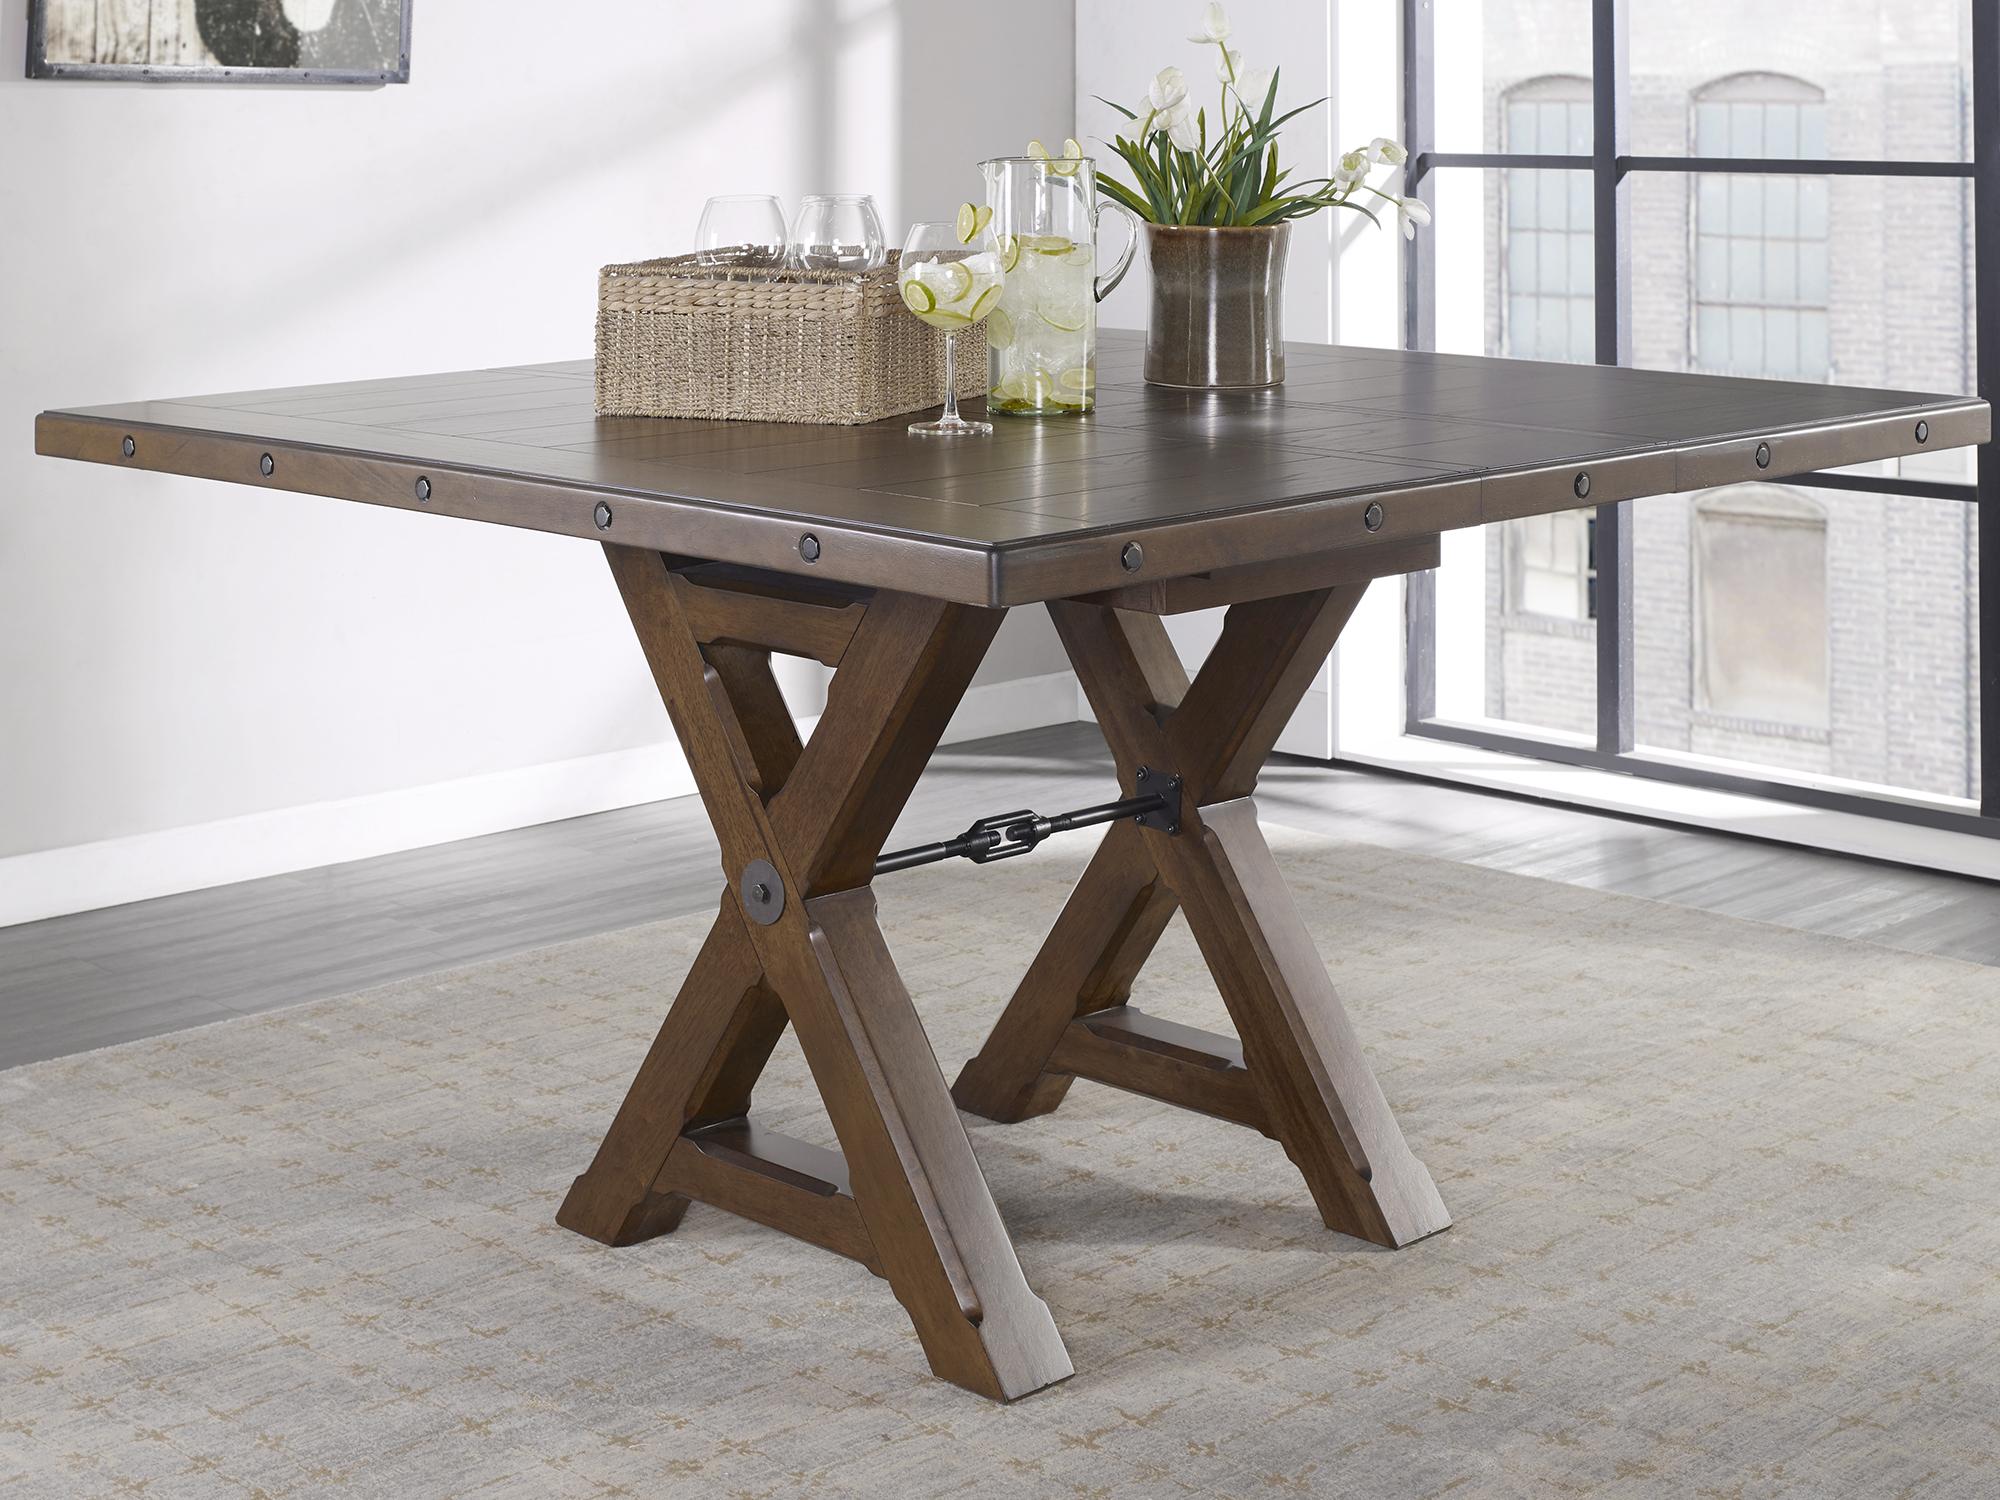 Table-WS.jpg